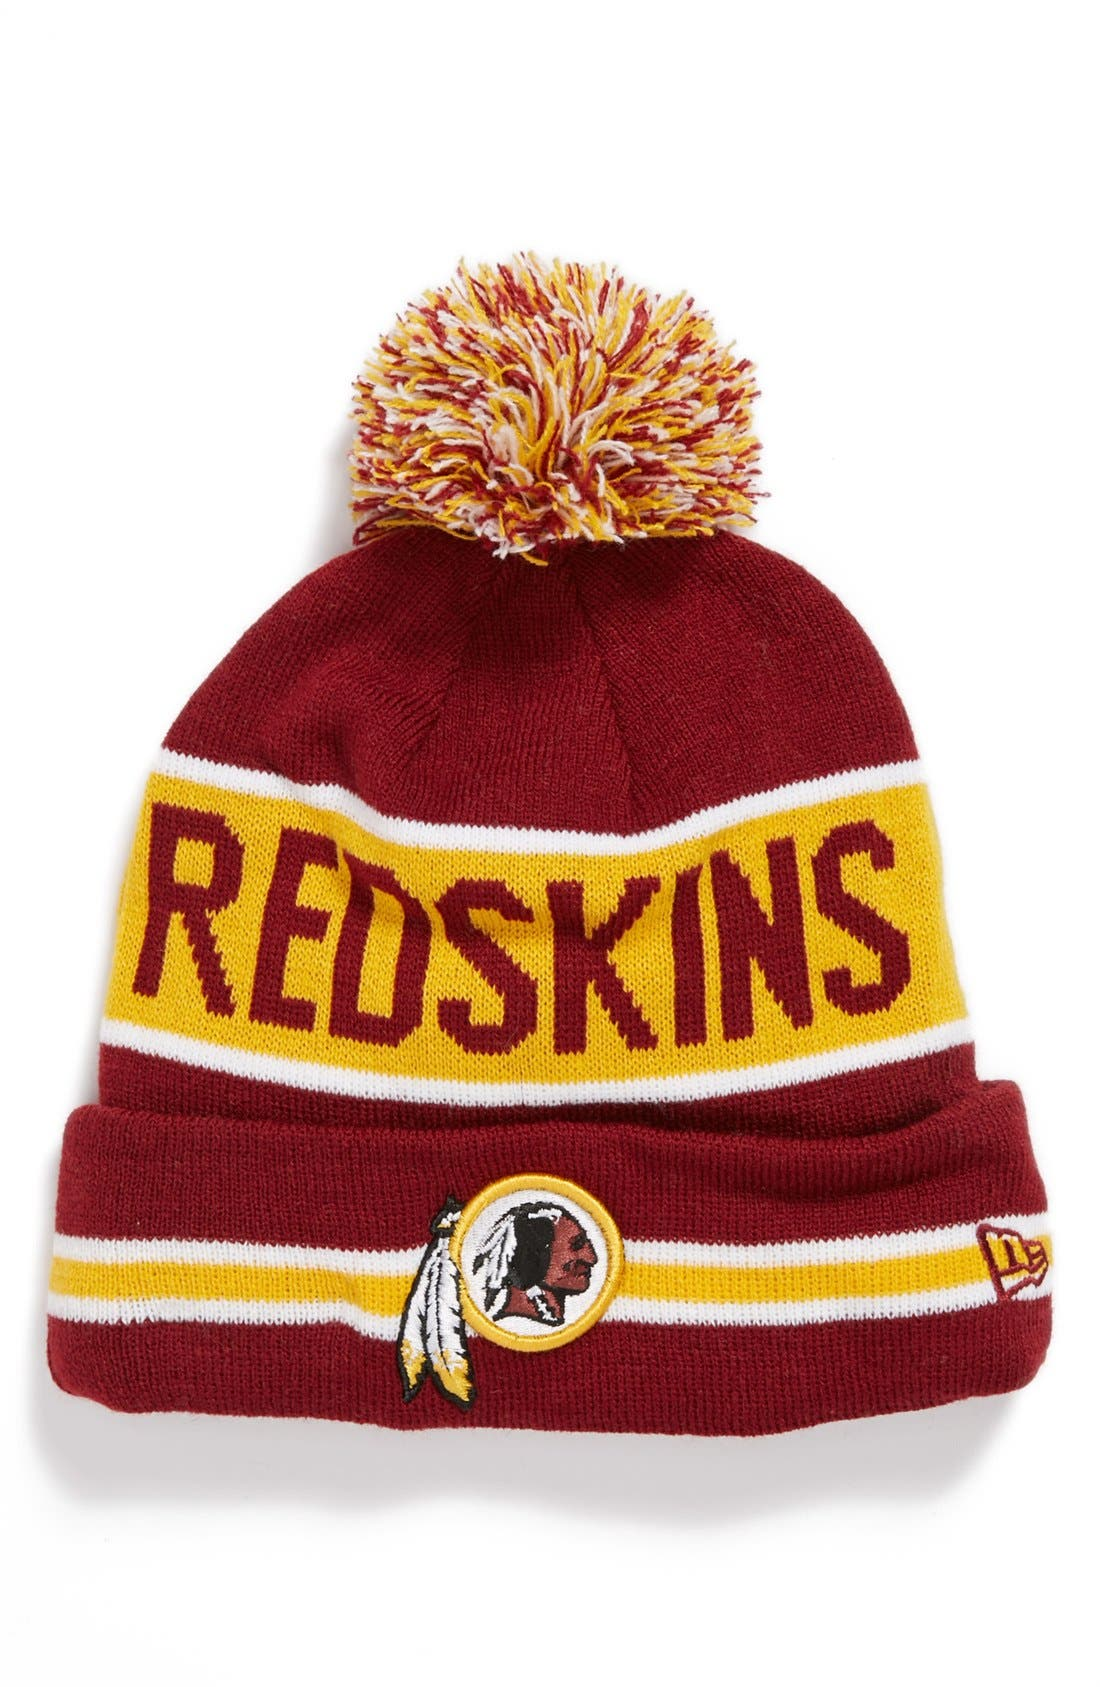 Alternate Image 1 Selected - New Era Cap 'The Coach - Washington Redskins' Knit Cap